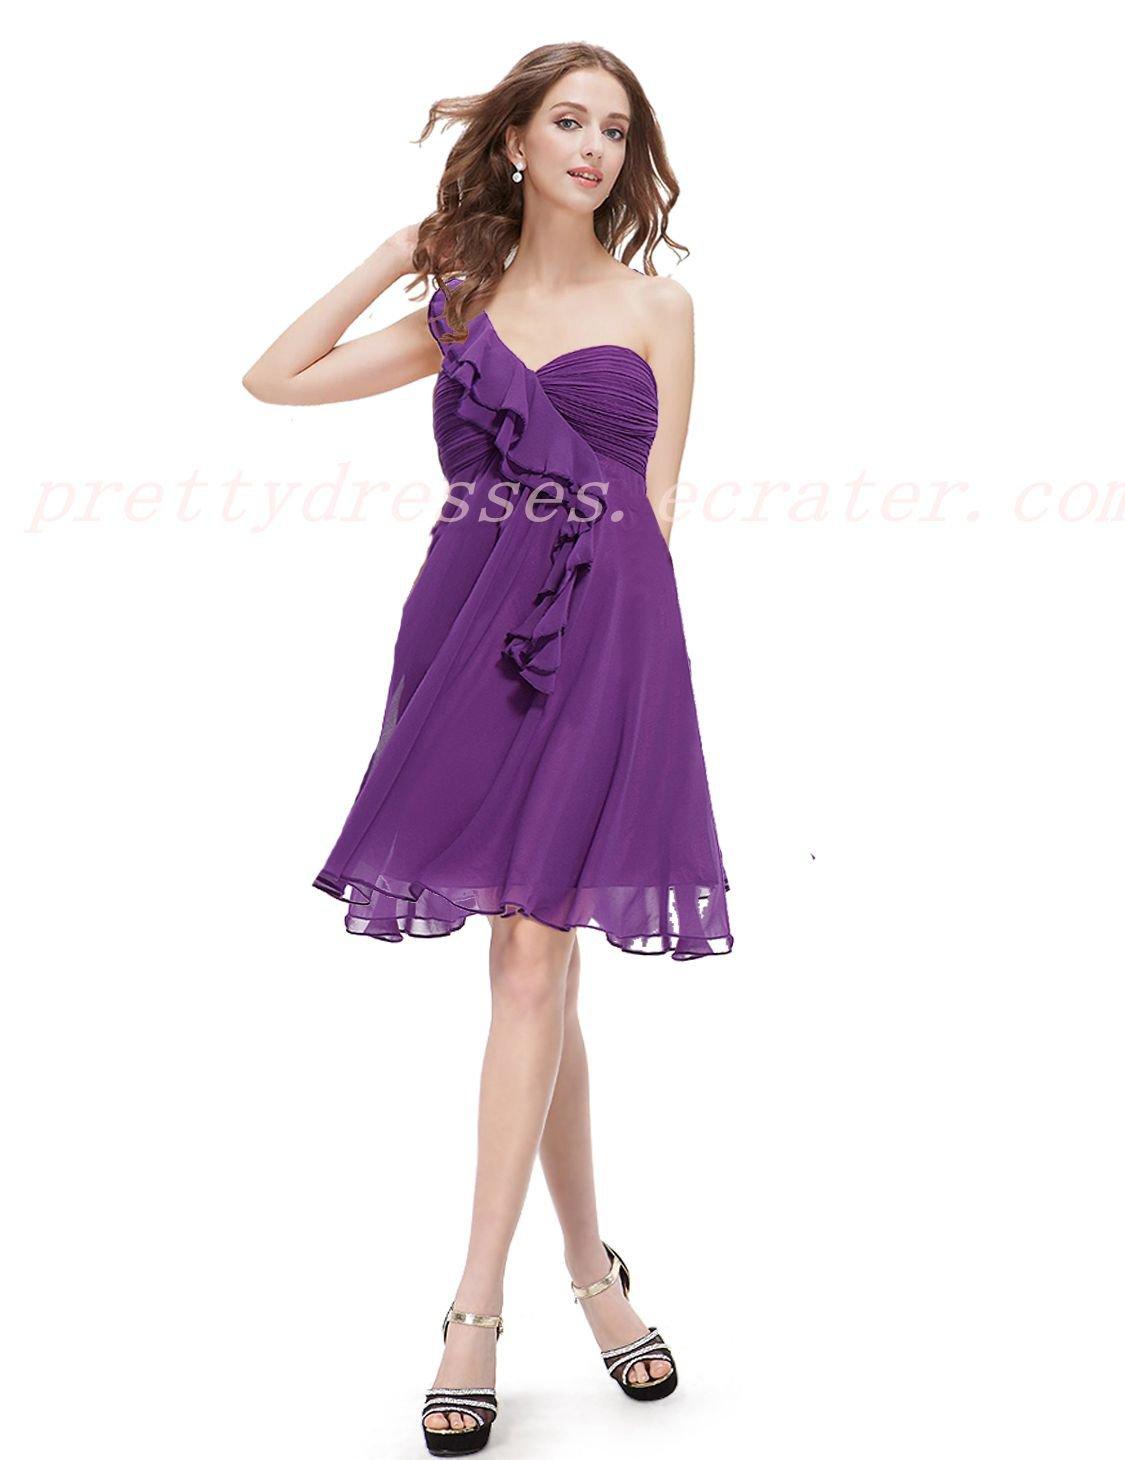 Cute One Shoulder Plum Short Bridesmaid Dress